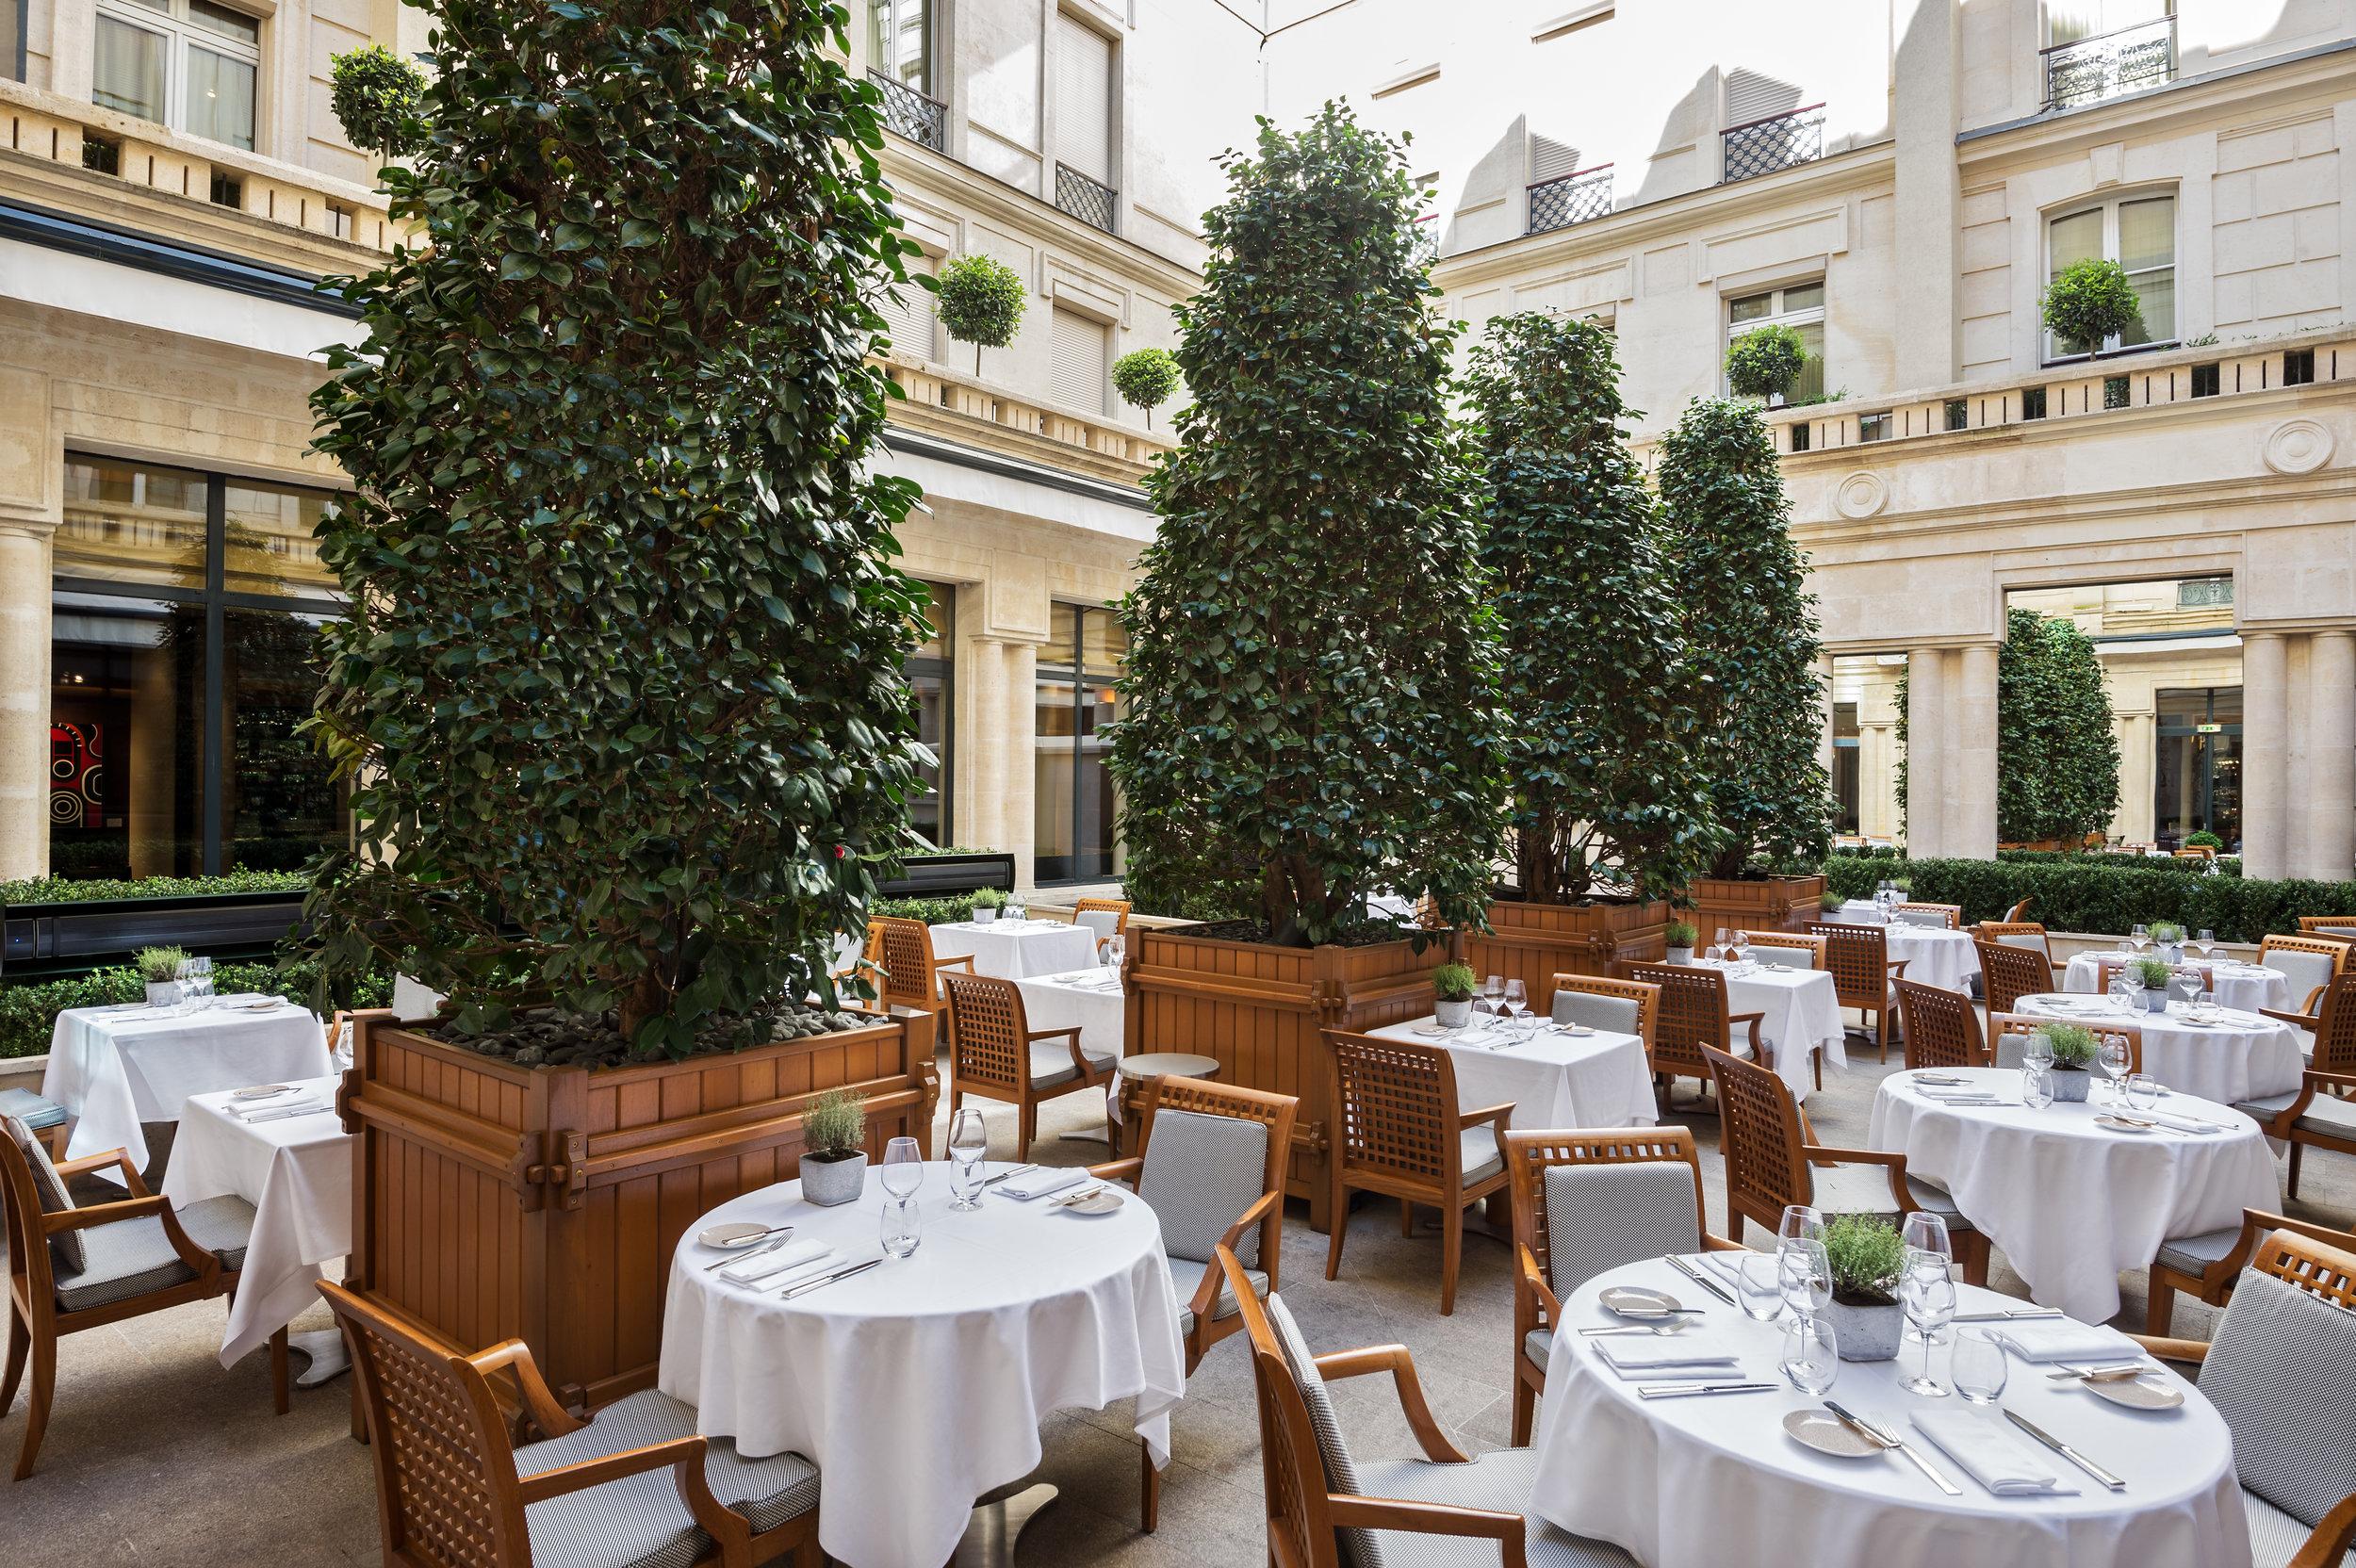 Panerai Yacht Club Terrace - Park Hyatt Paris-Vendôme